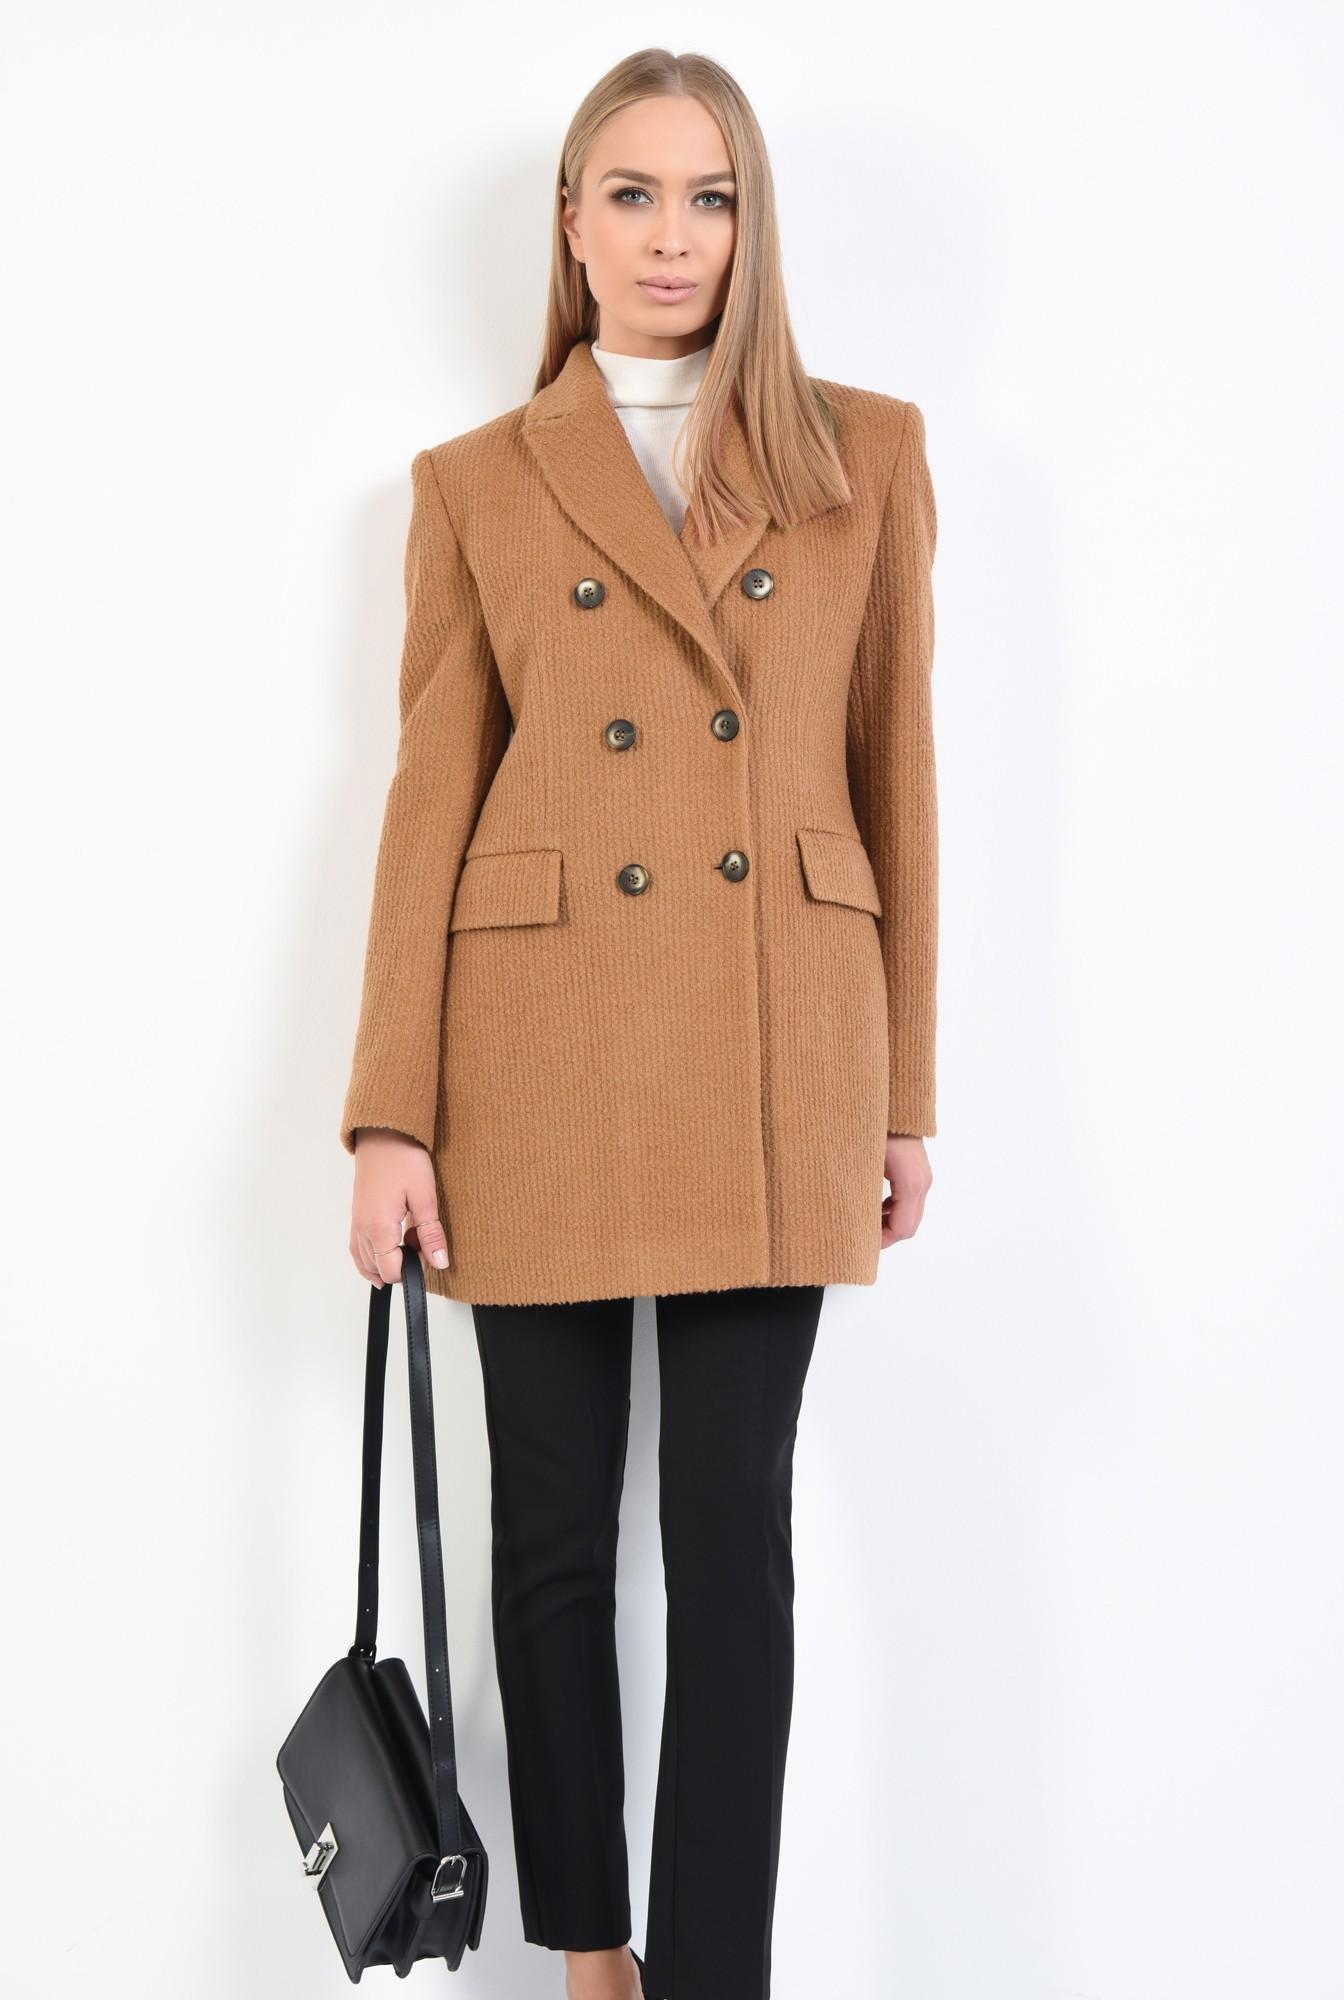 0 - palton scurt, revere crestate, doua randuri de nasturi